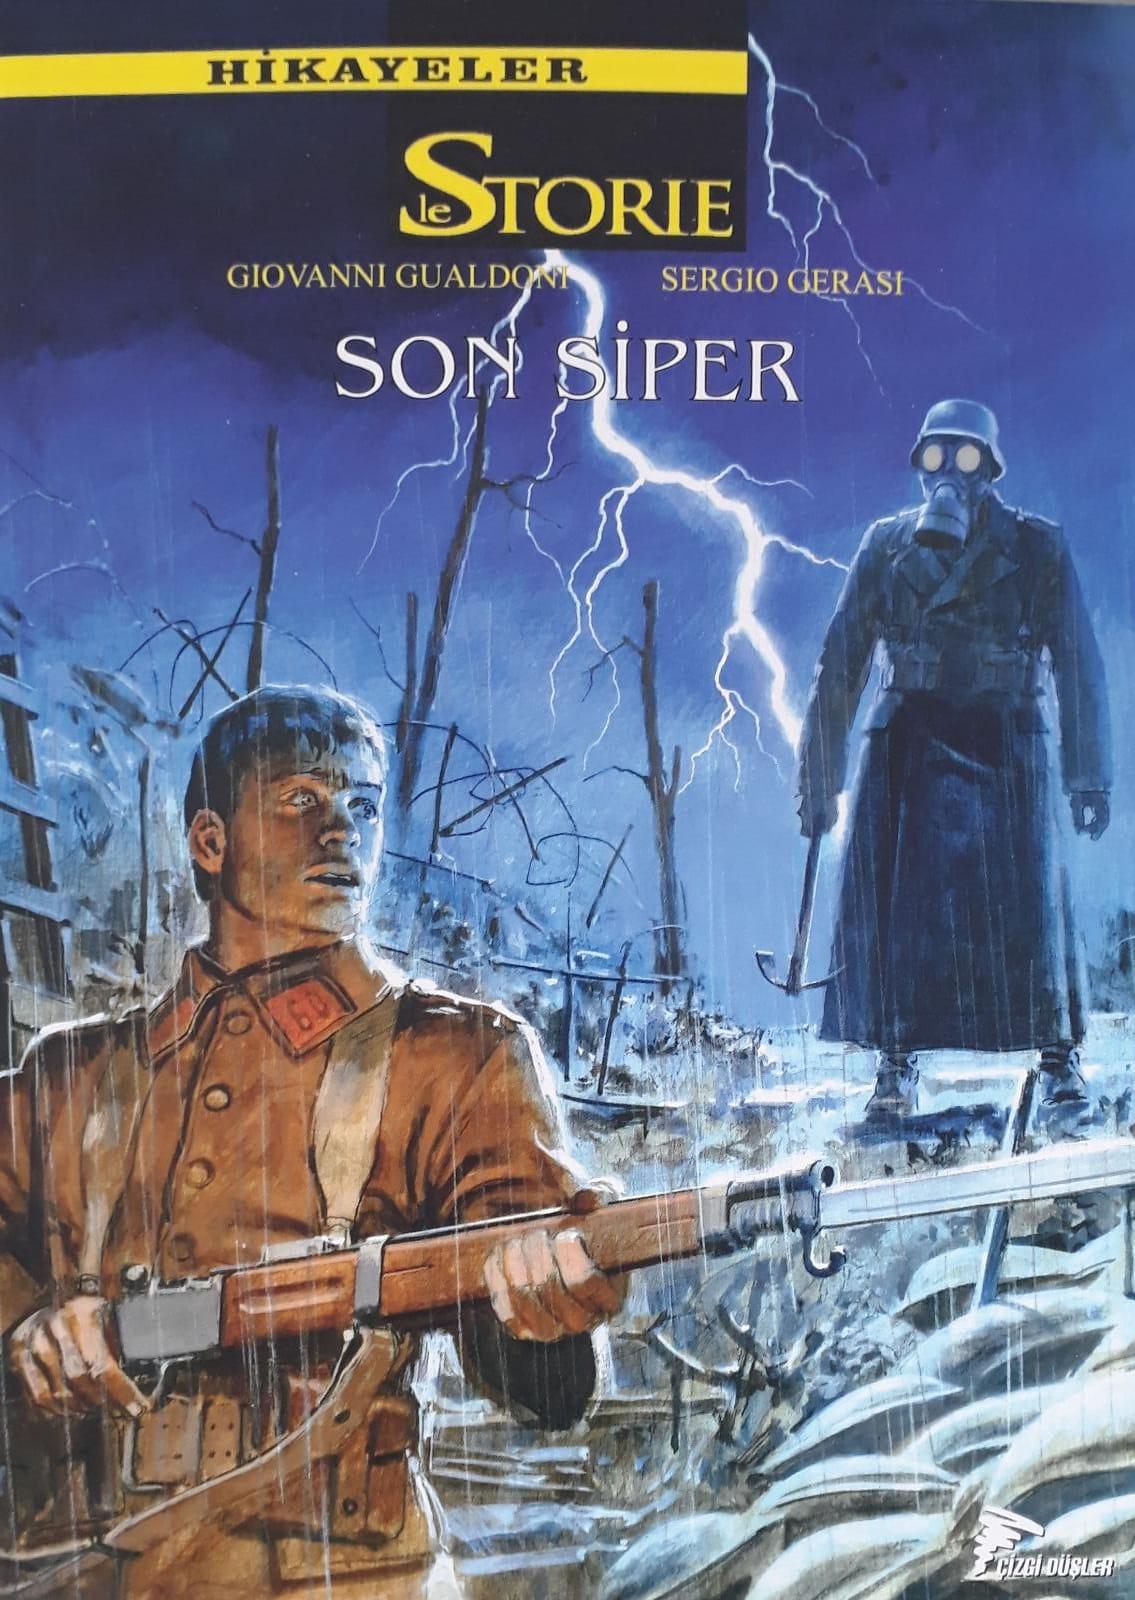 Hikayeler - Le Storie Cilt 11: Son Siper